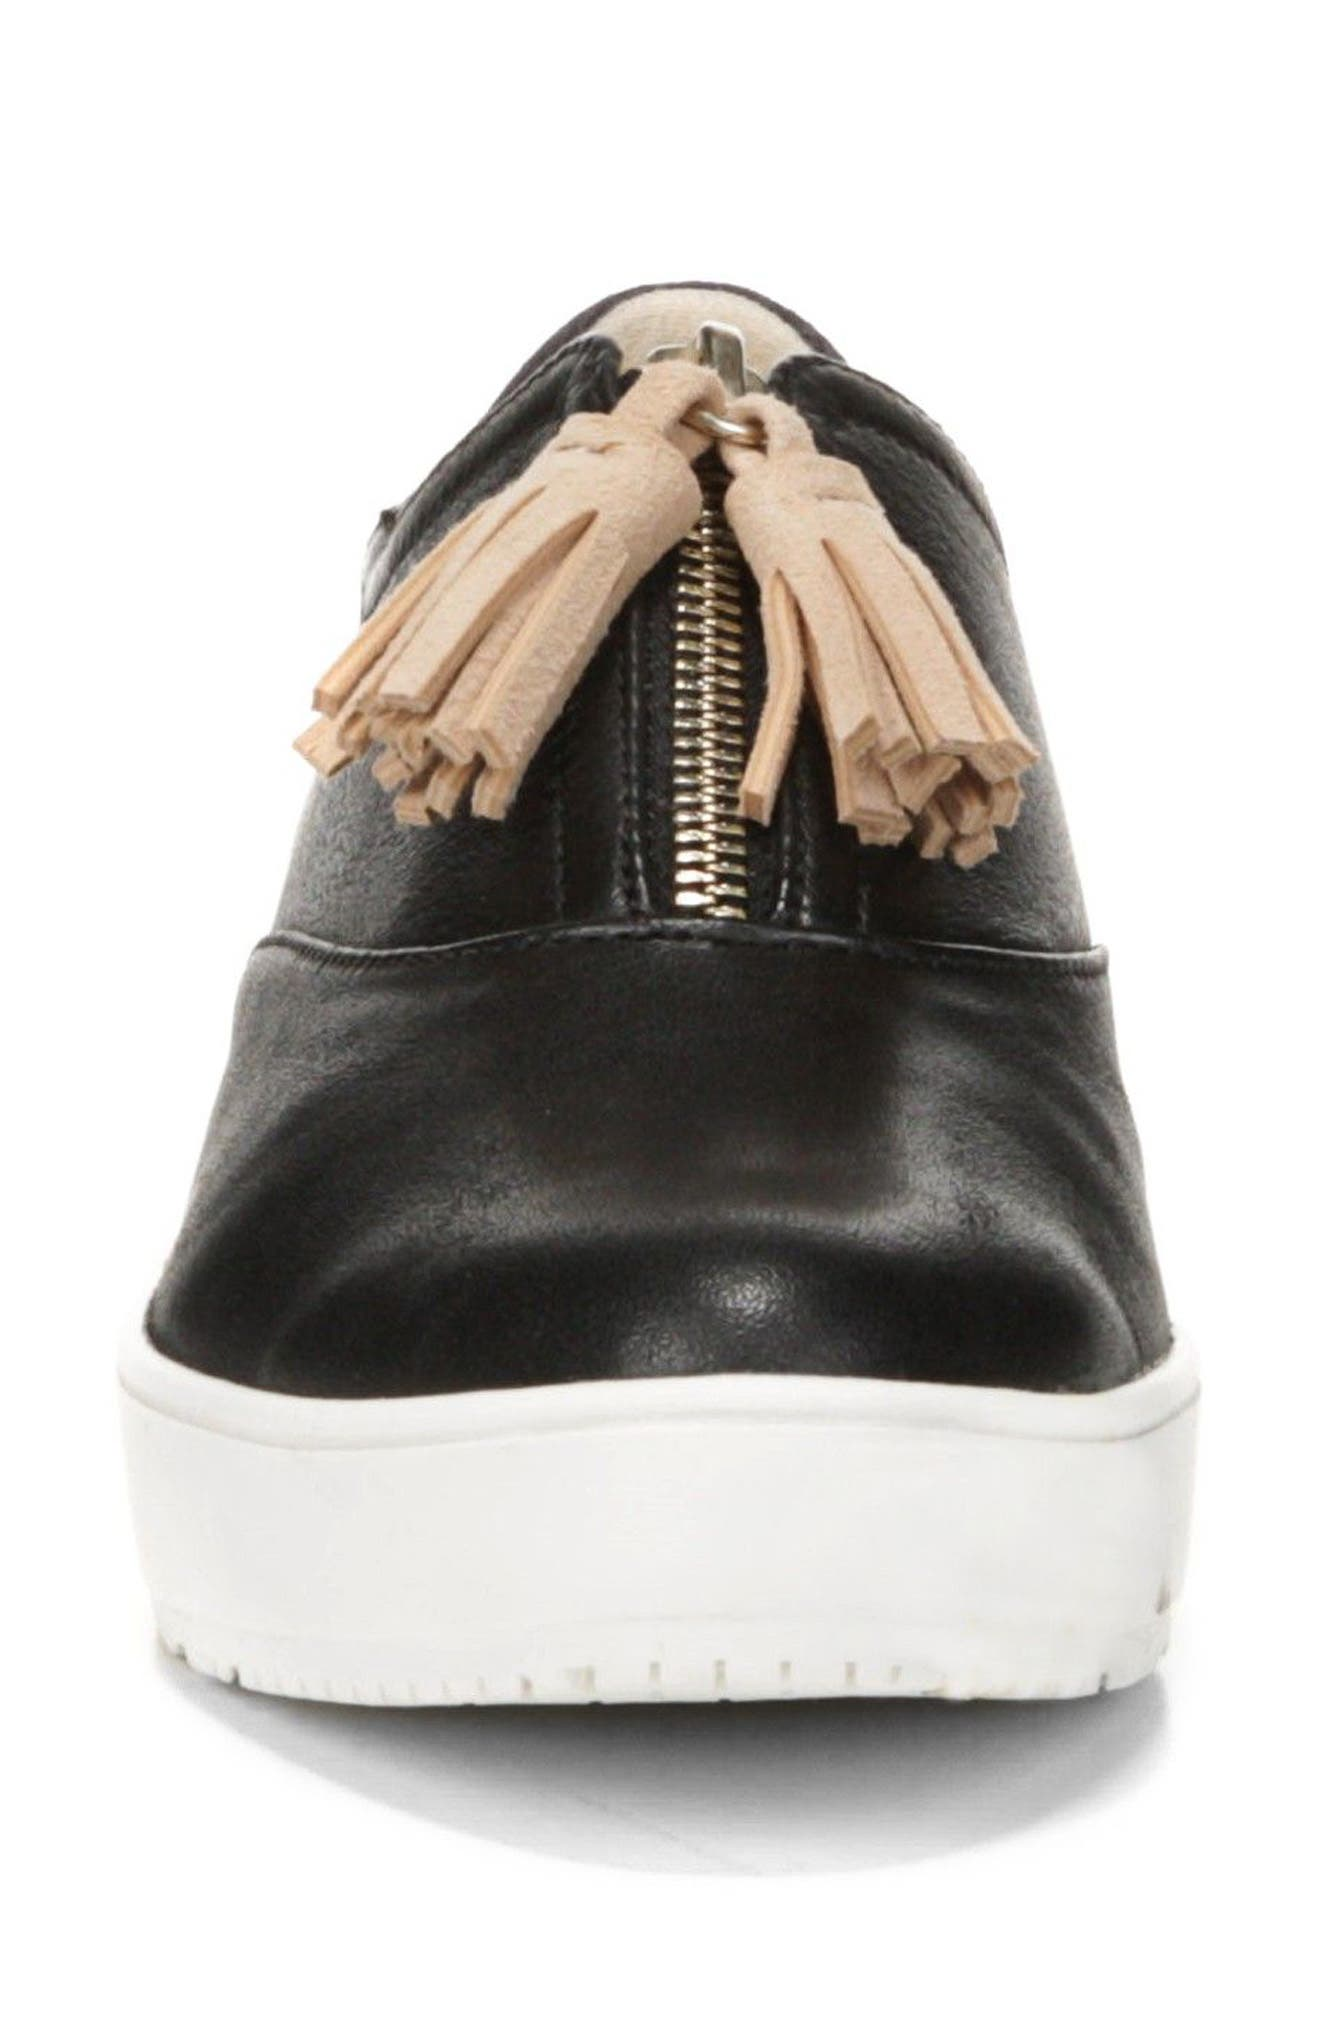 Blakely Tassel Zip Sneaker,                             Alternate thumbnail 4, color,                             001